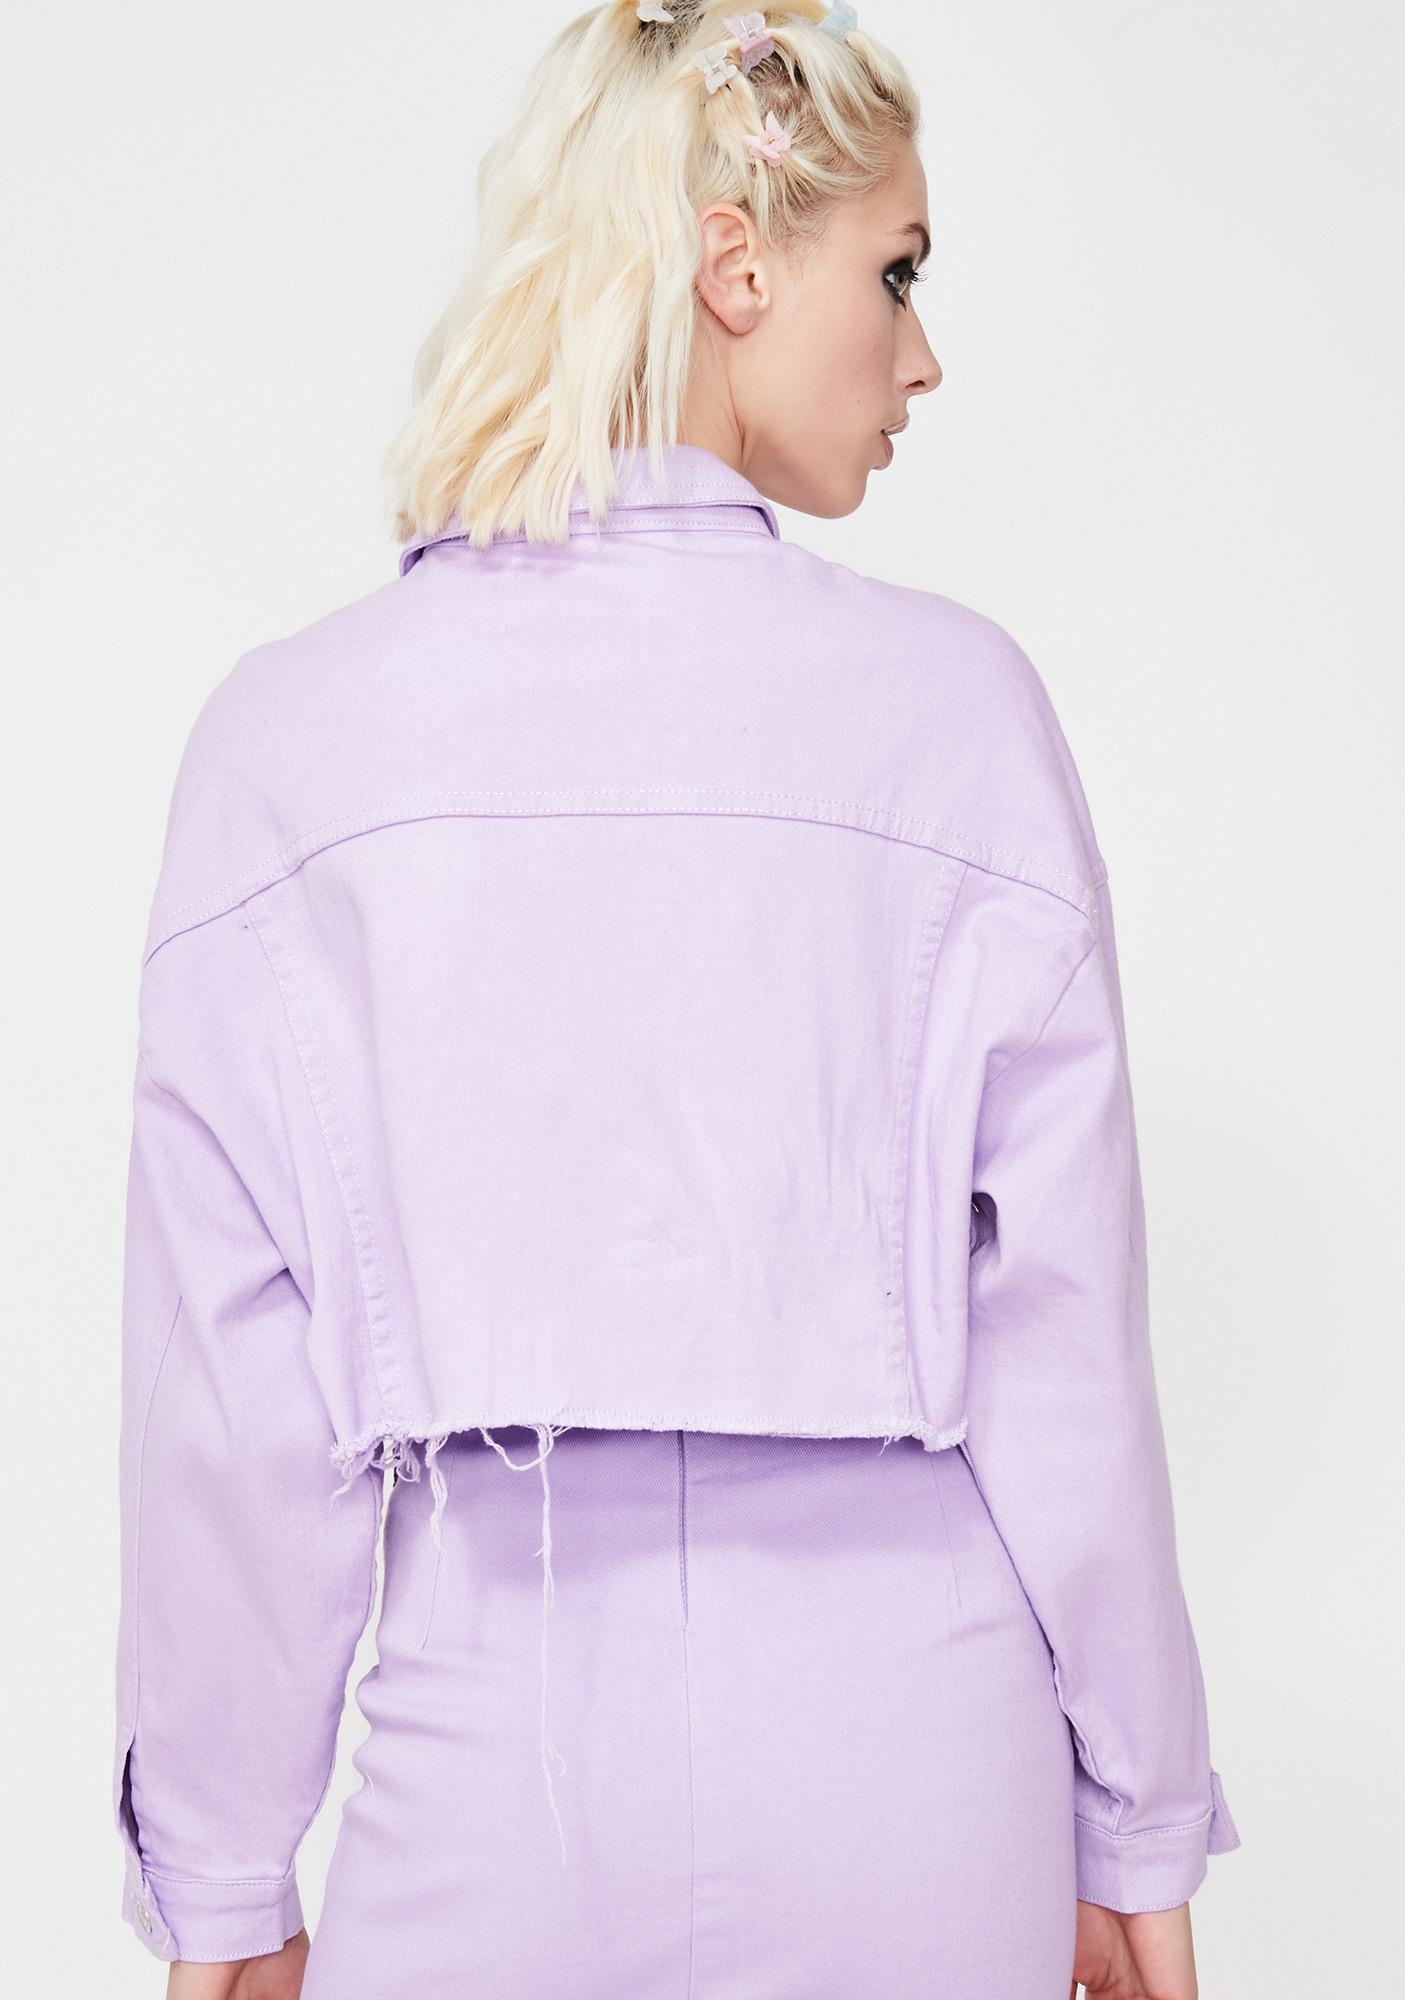 Poppin' Princess Denim Jacket